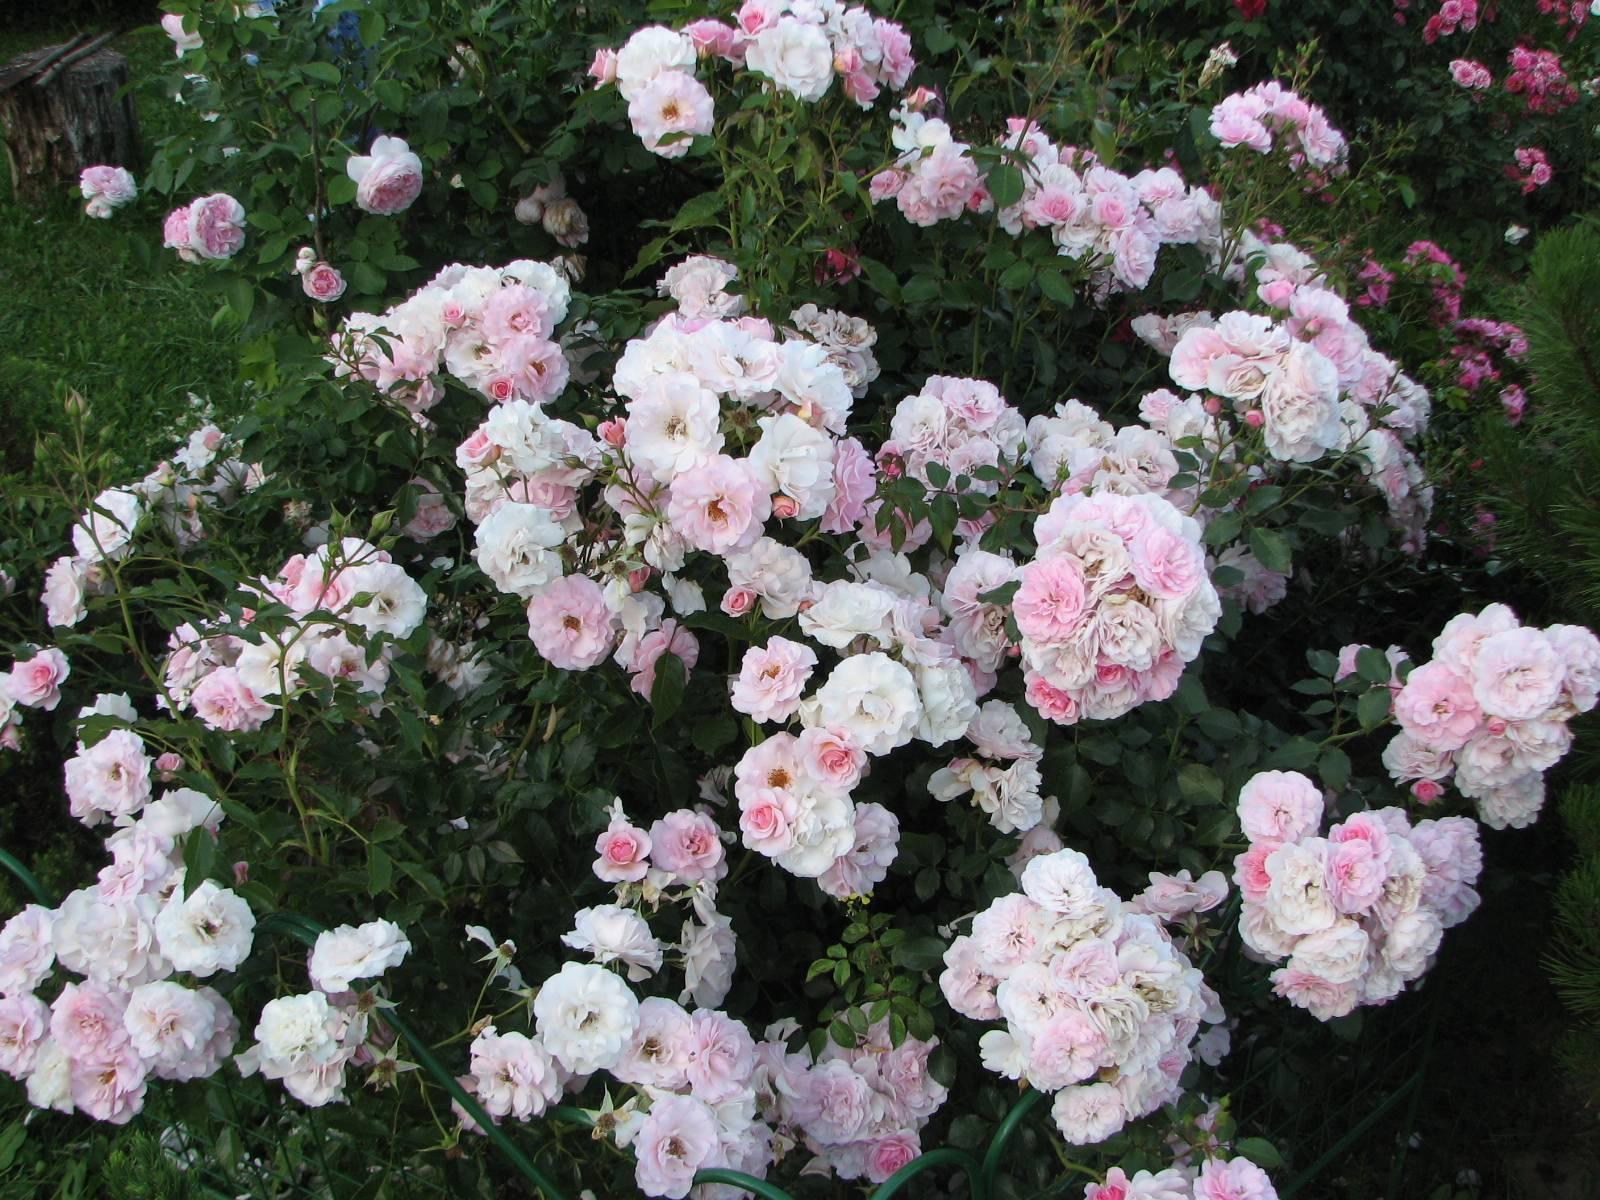 Растение из класса флорибунда — роза боника 82